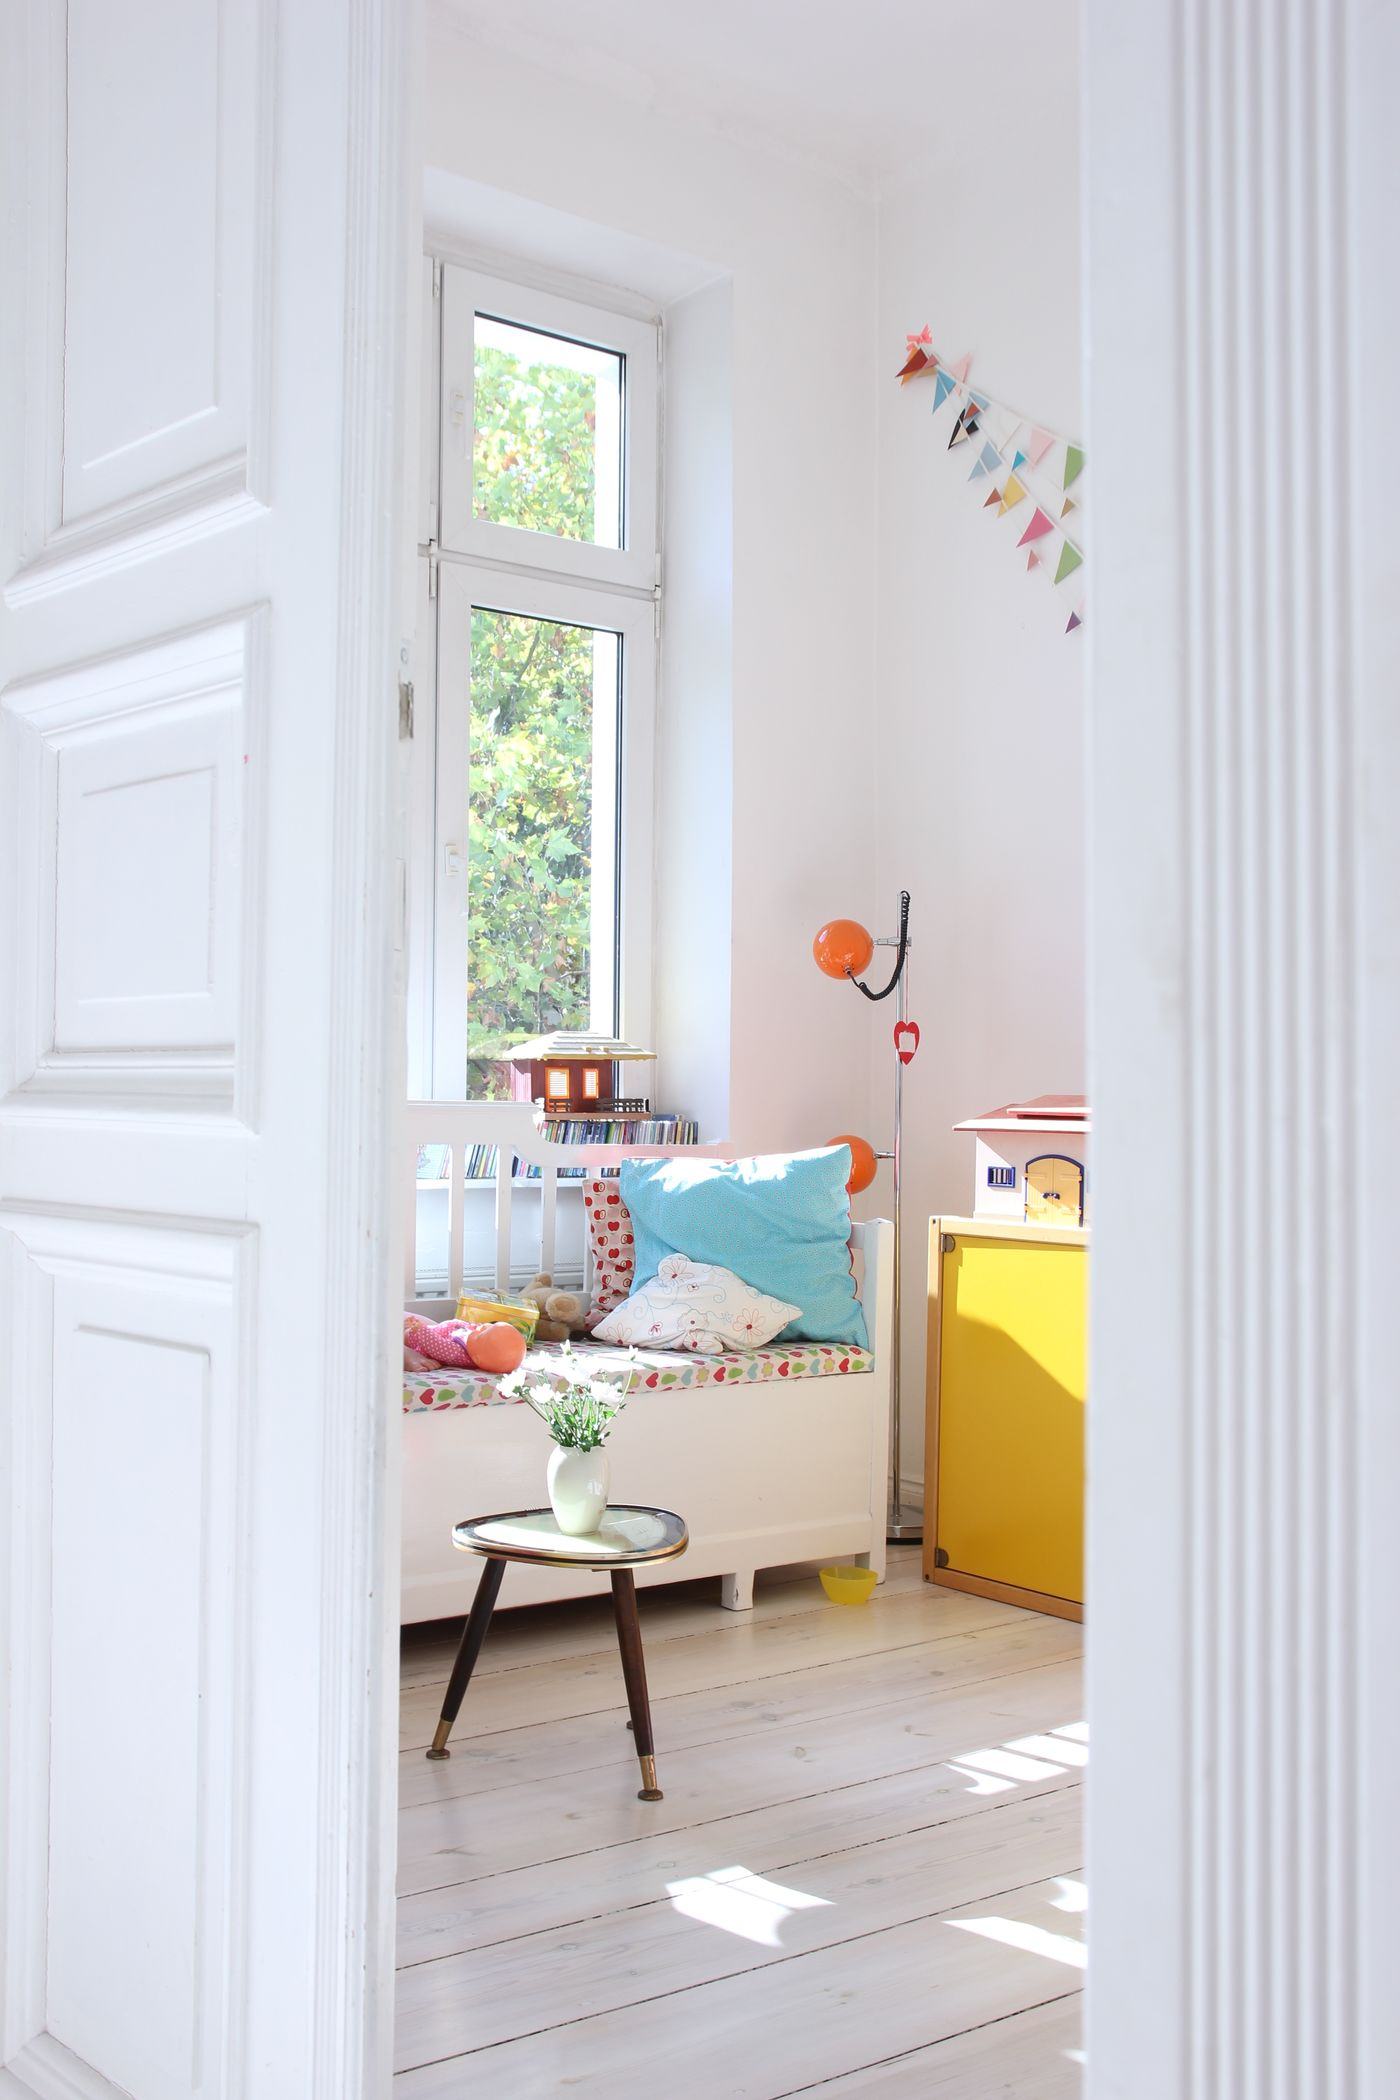 Full Size of Kinderzimmer Regal Sofa Regale Weiß Kinderzimmer Kinderzimmer Einrichtung